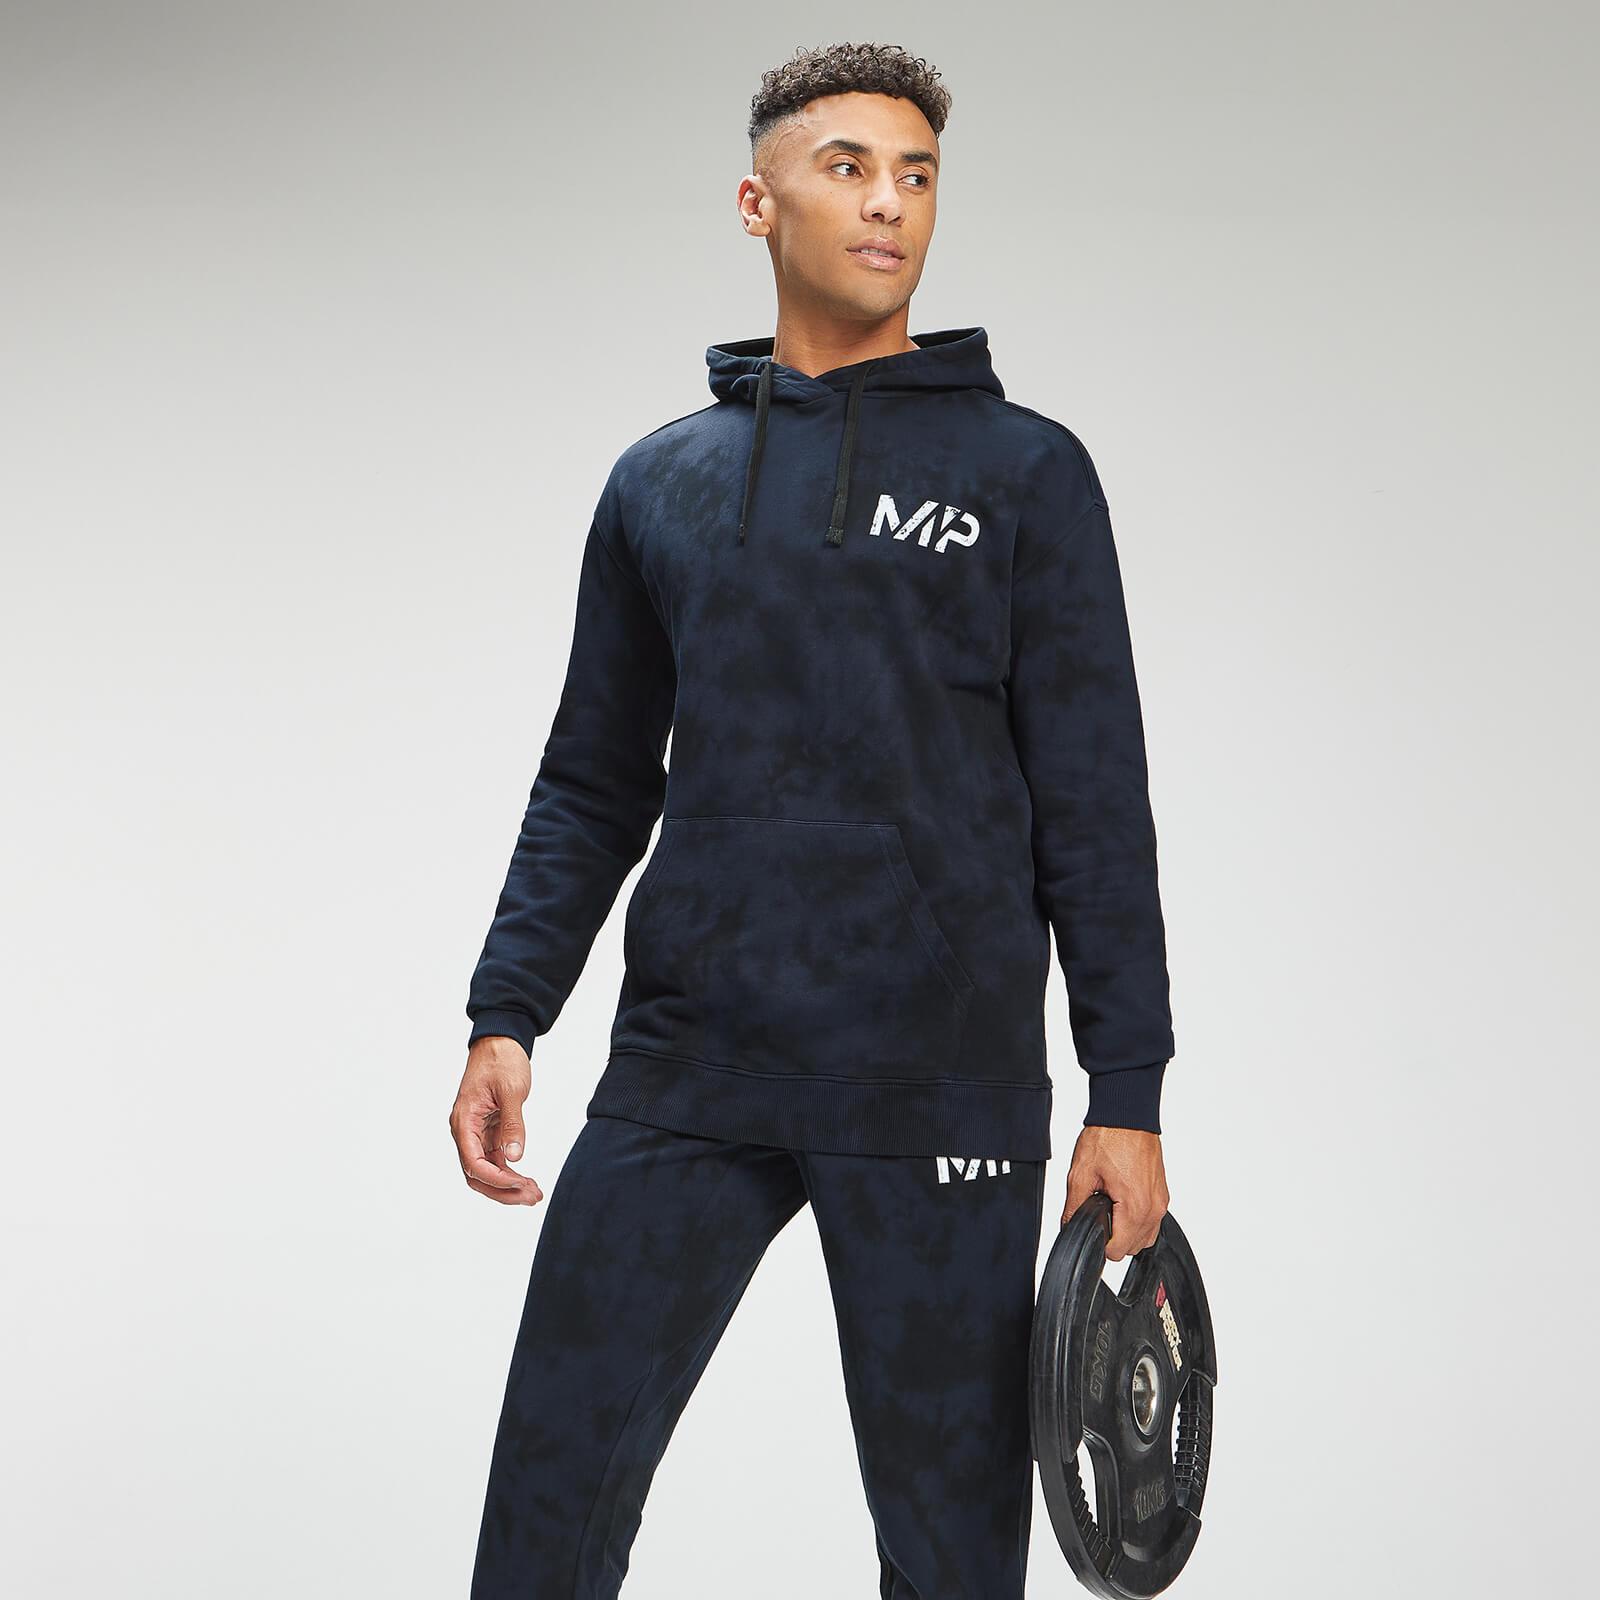 Купить MP Men's Adapt Tie Dye Hoodie - Petrol Blue/Black - XXS, Myprotein International